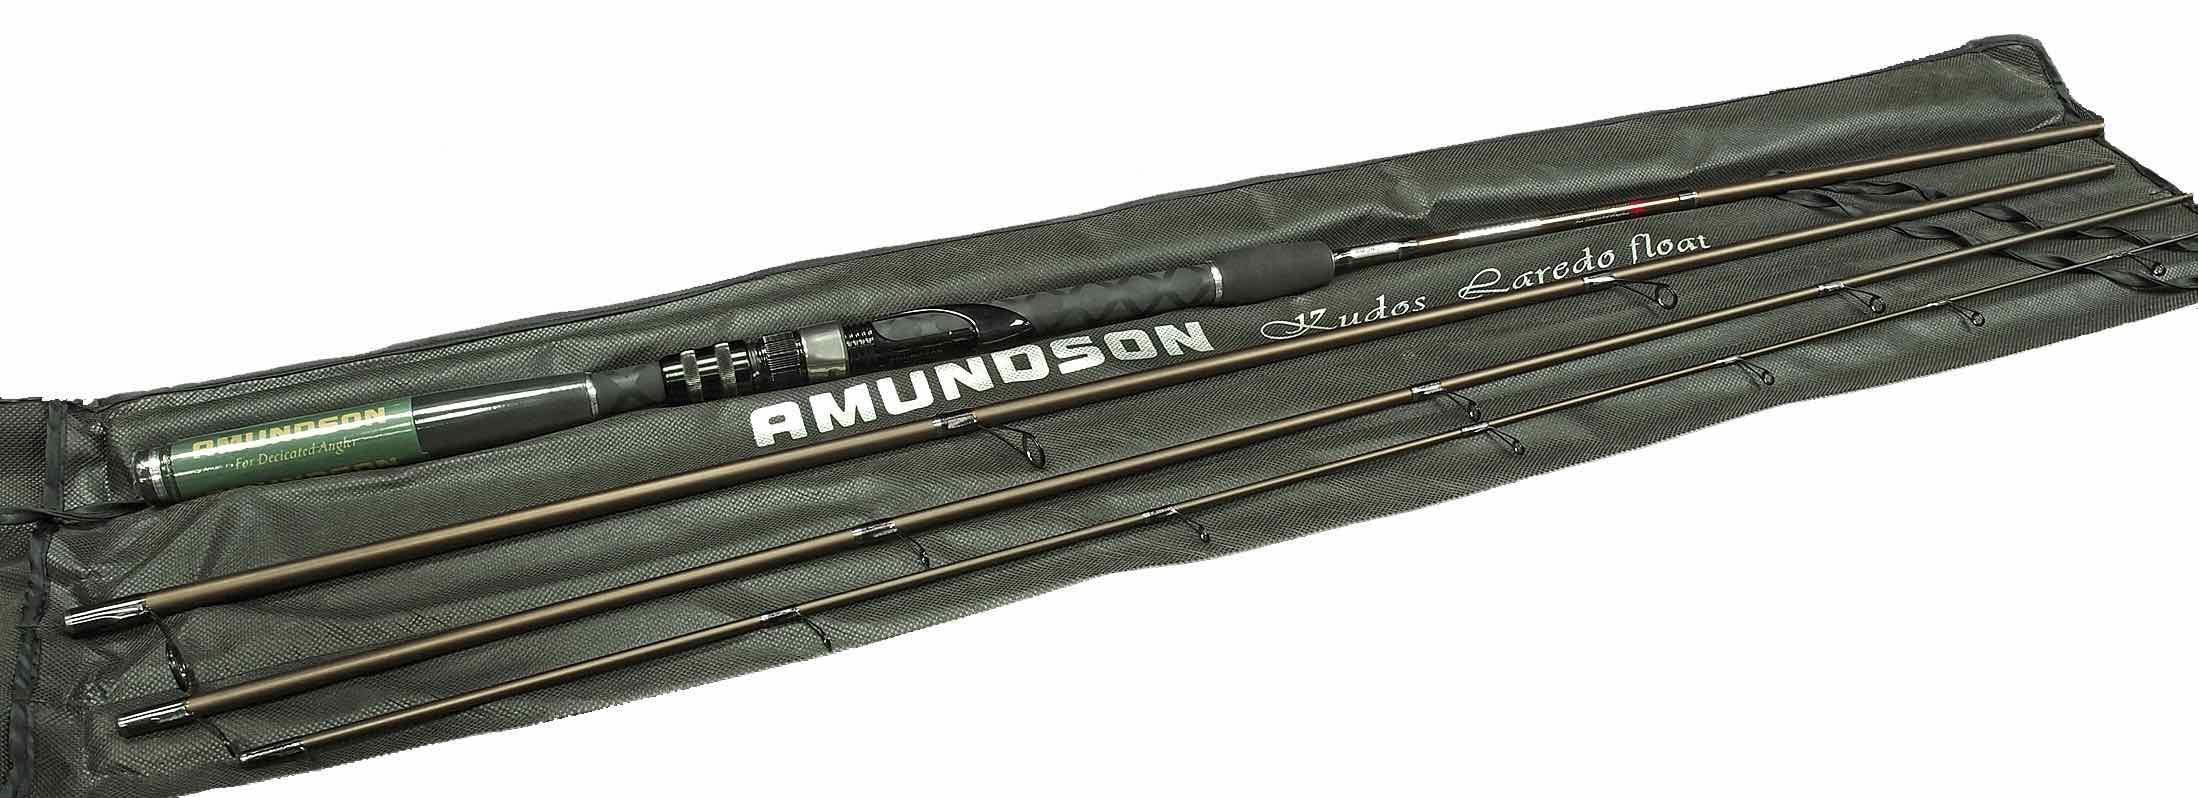 Amundson Centerpin Float Rod Amundsen Kudos Larado Float Centerpin Rod DD